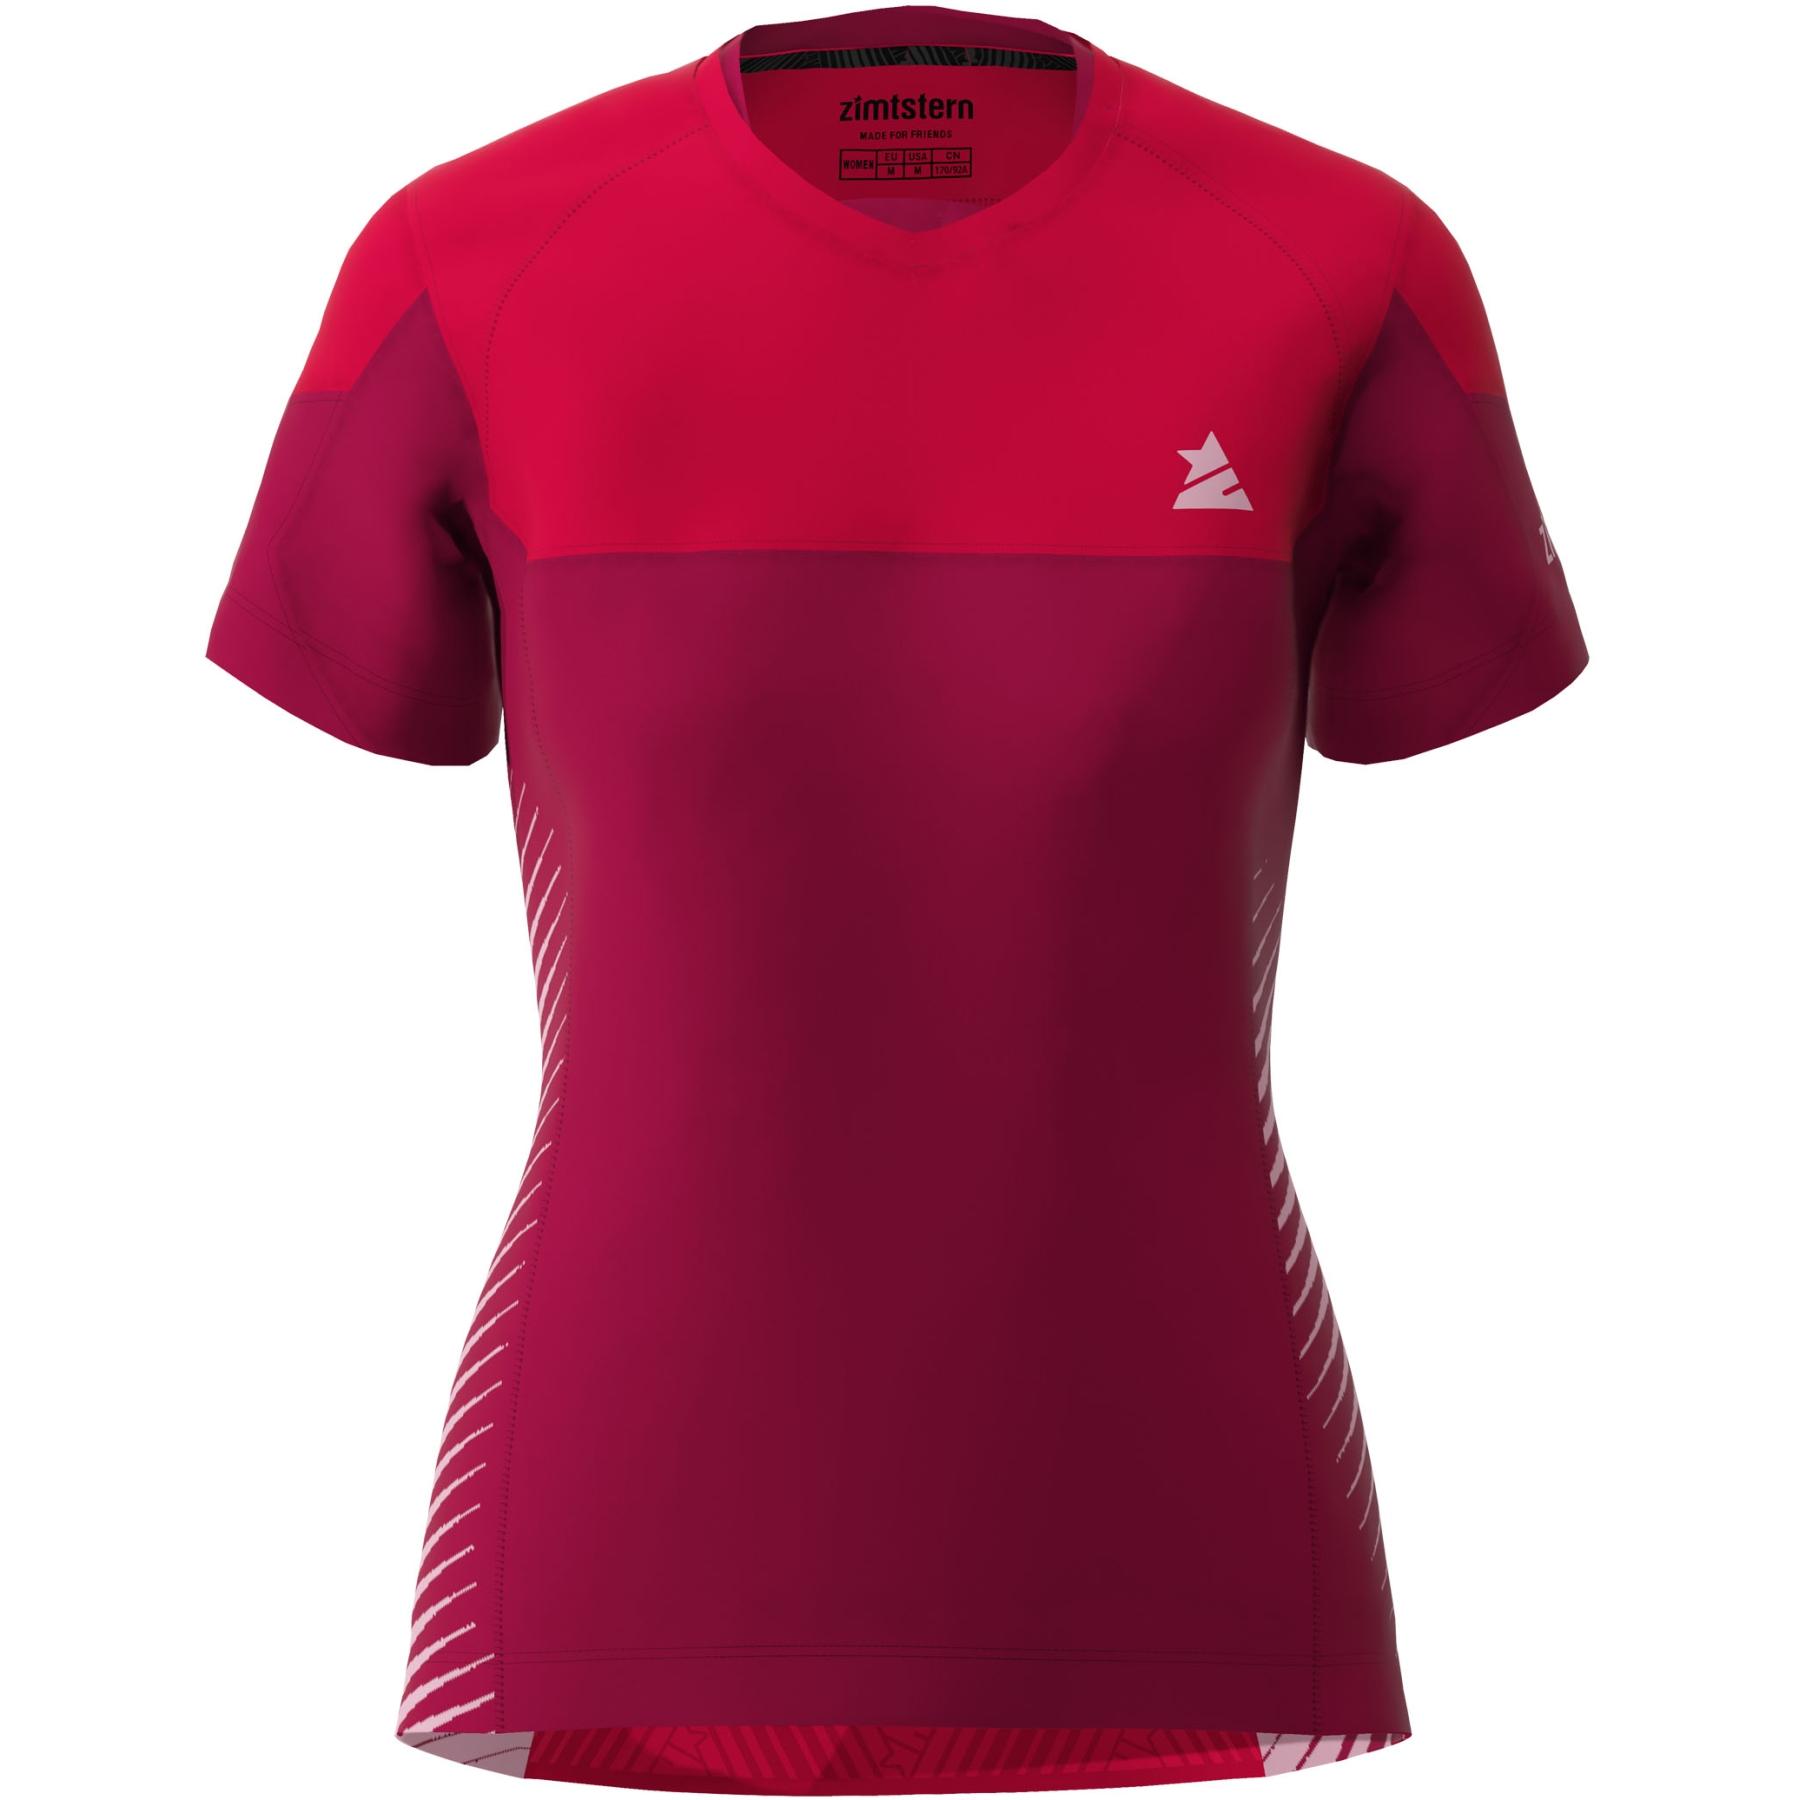 Zimtstern Bulletz Kurzarm-Shirt Damen - jester red/cyber red